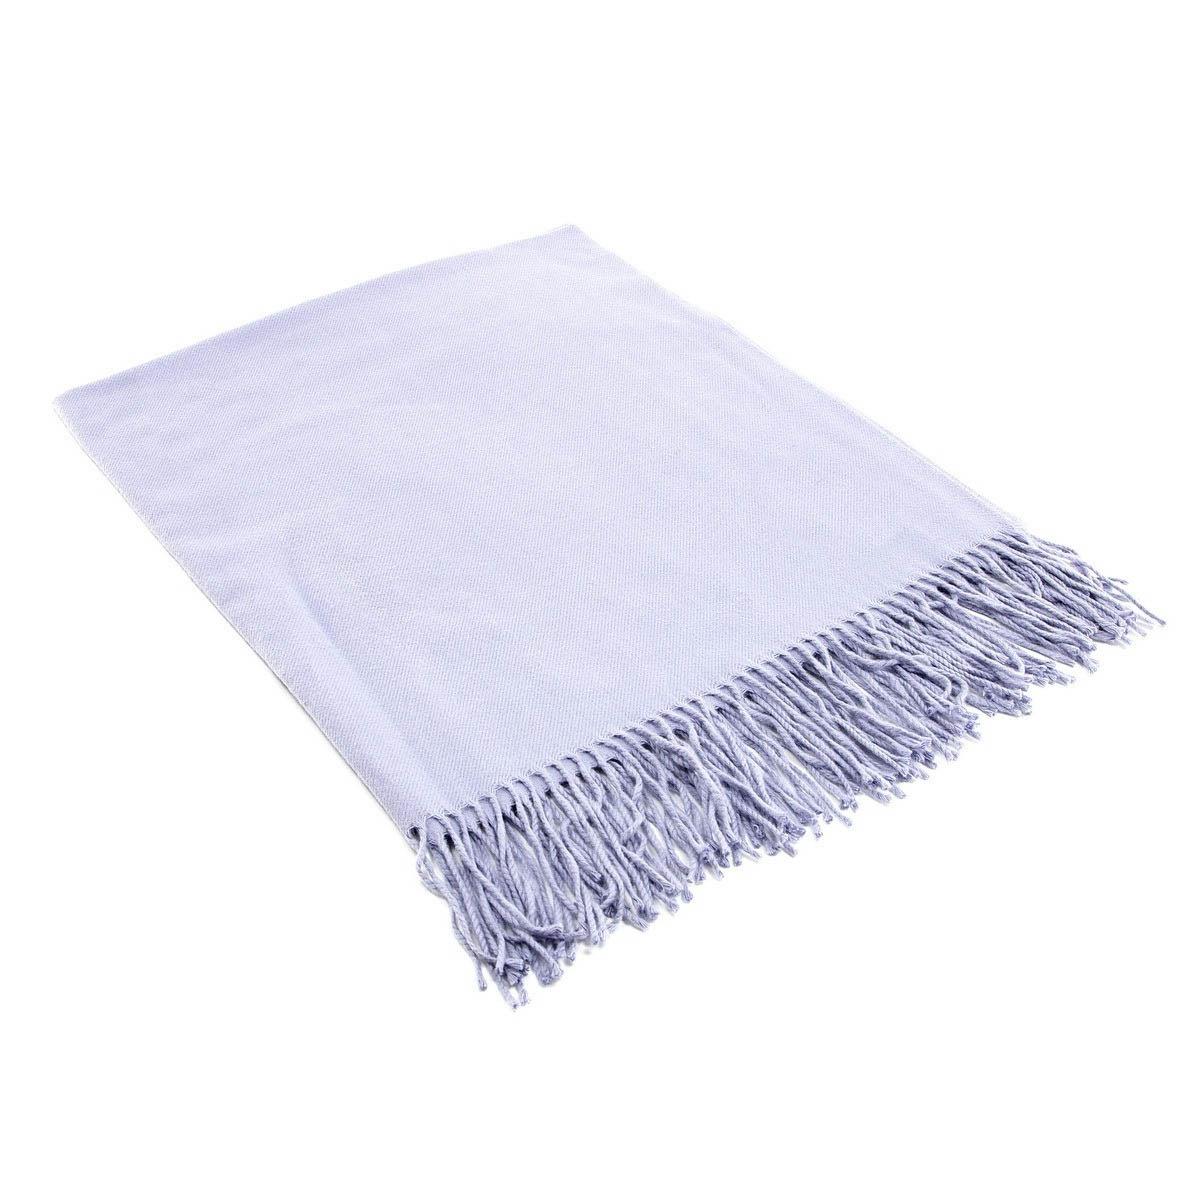 Детские покрывала, подушки, одеяла INCALPACA TPX Детский плед Bologna (85х110 см)